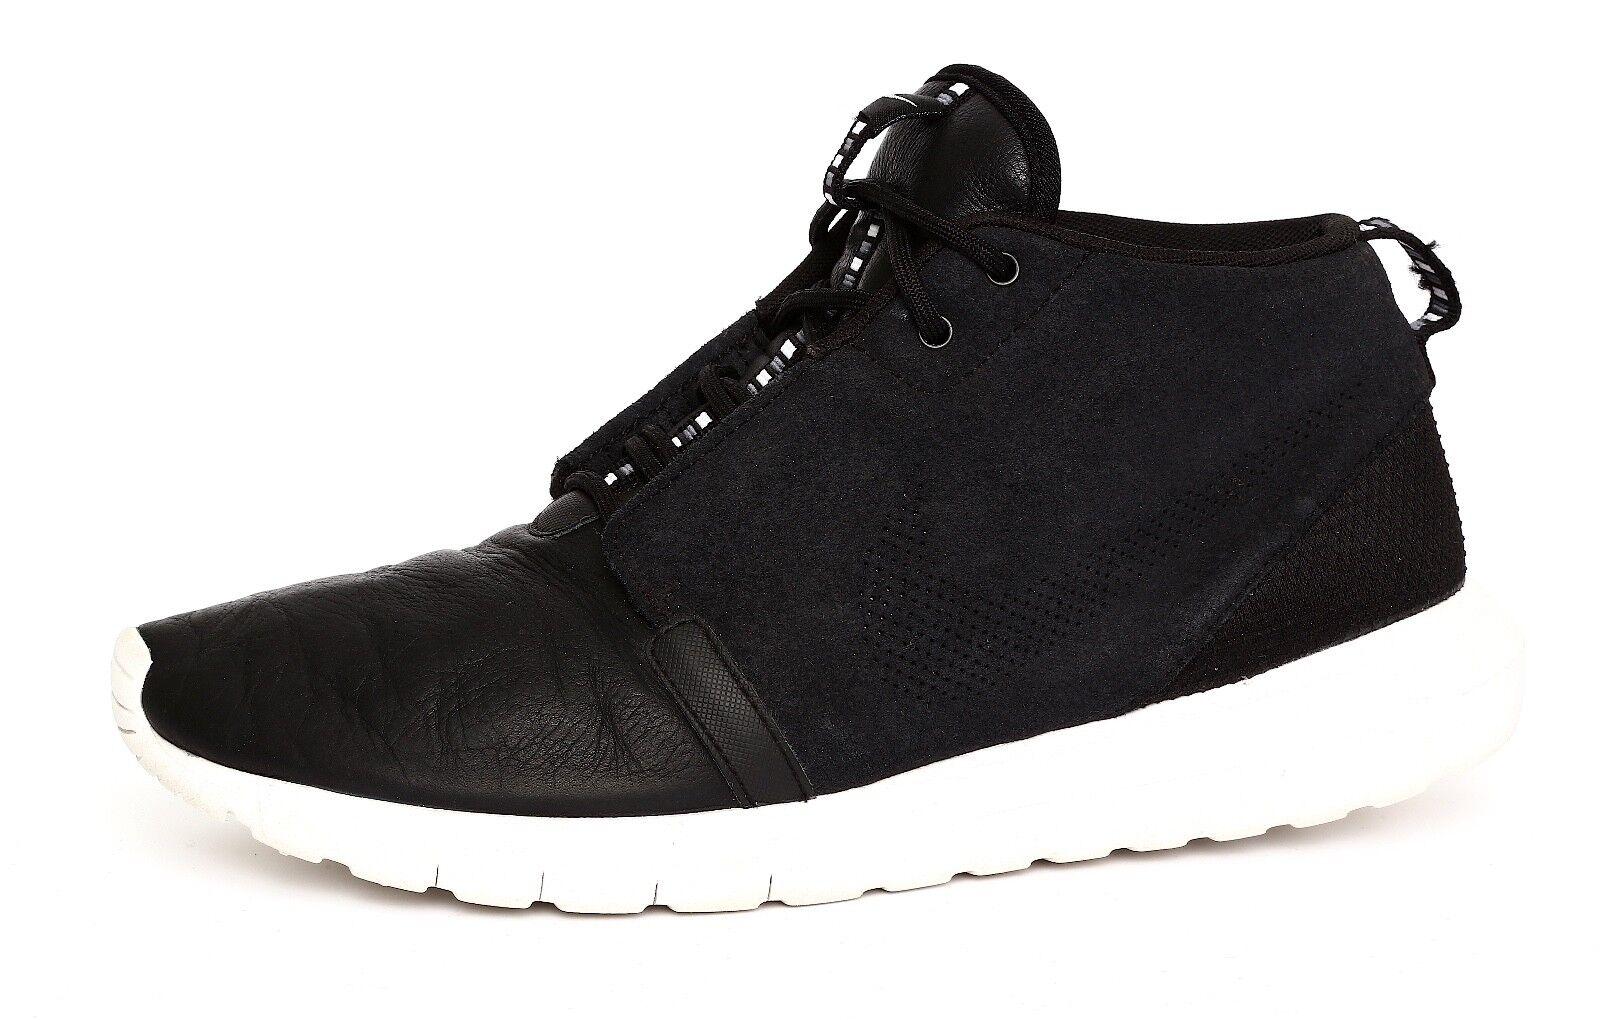 new style cc8f1 98dcf Nike Roshe Men s Black Sneaker Boot Sz Sz Sz 9 1619 3c9596